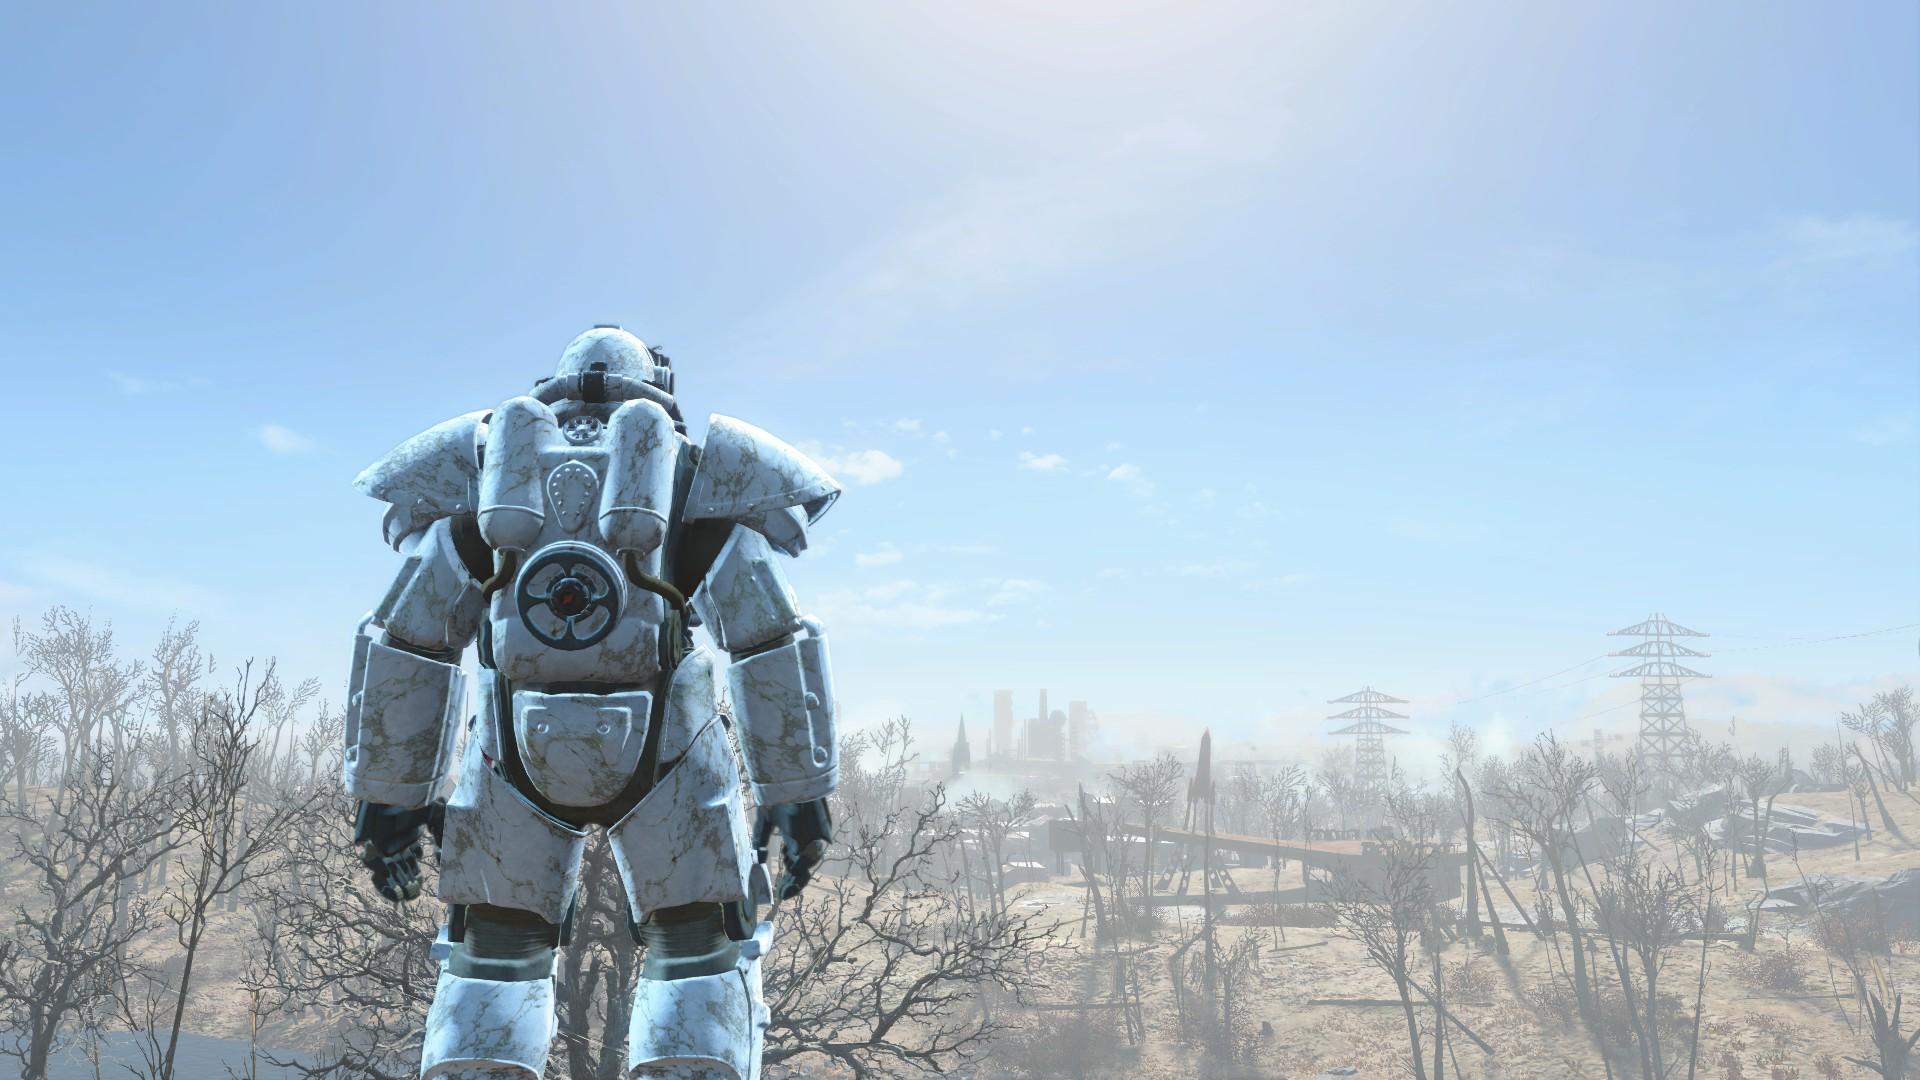 20190420221253_1.jpg - Fallout 4